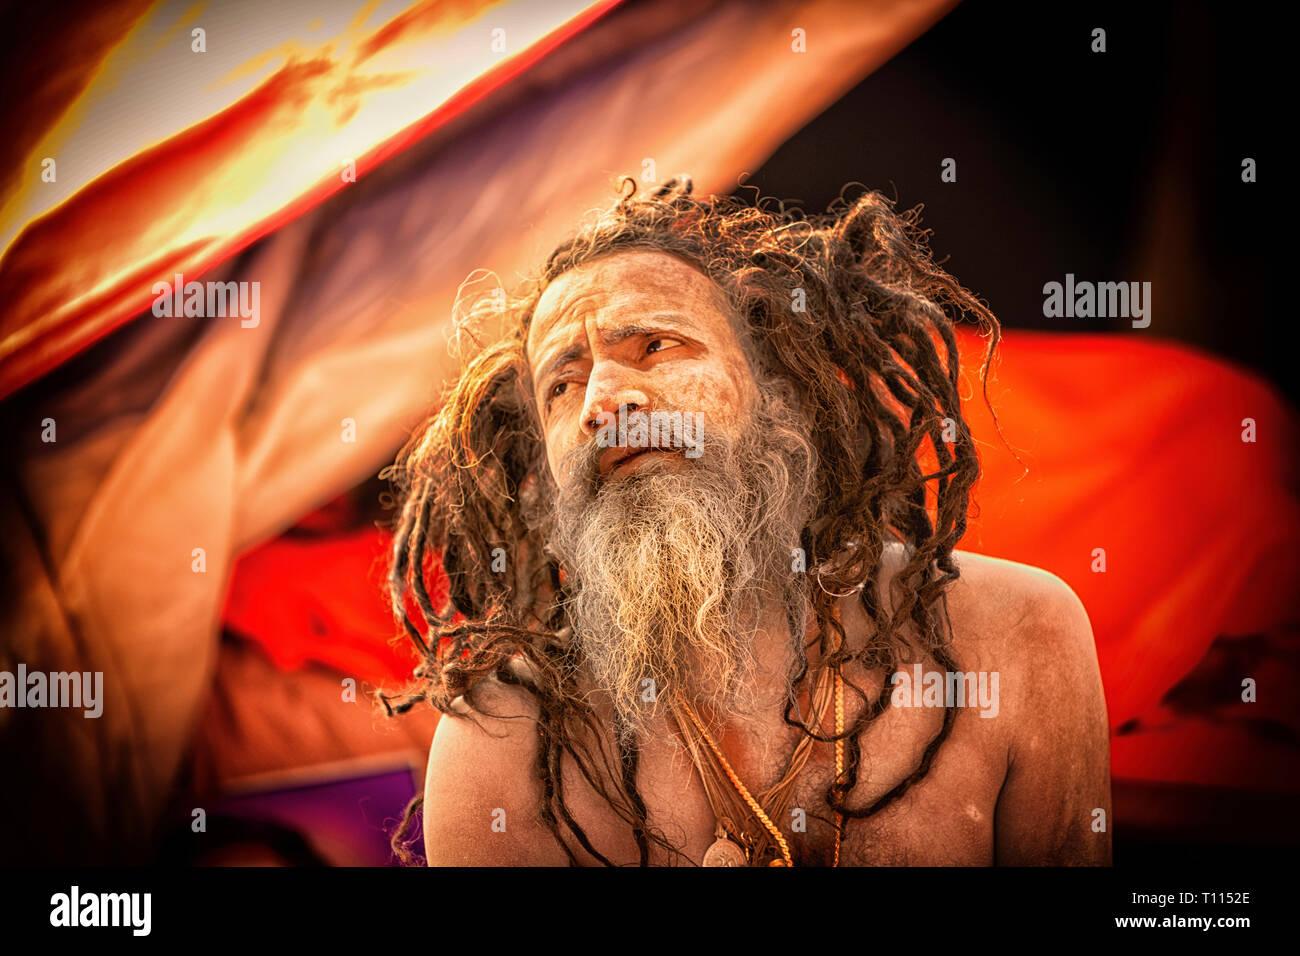 Naga Sadhu at the Kumbh Mela 2019 - Stock Image